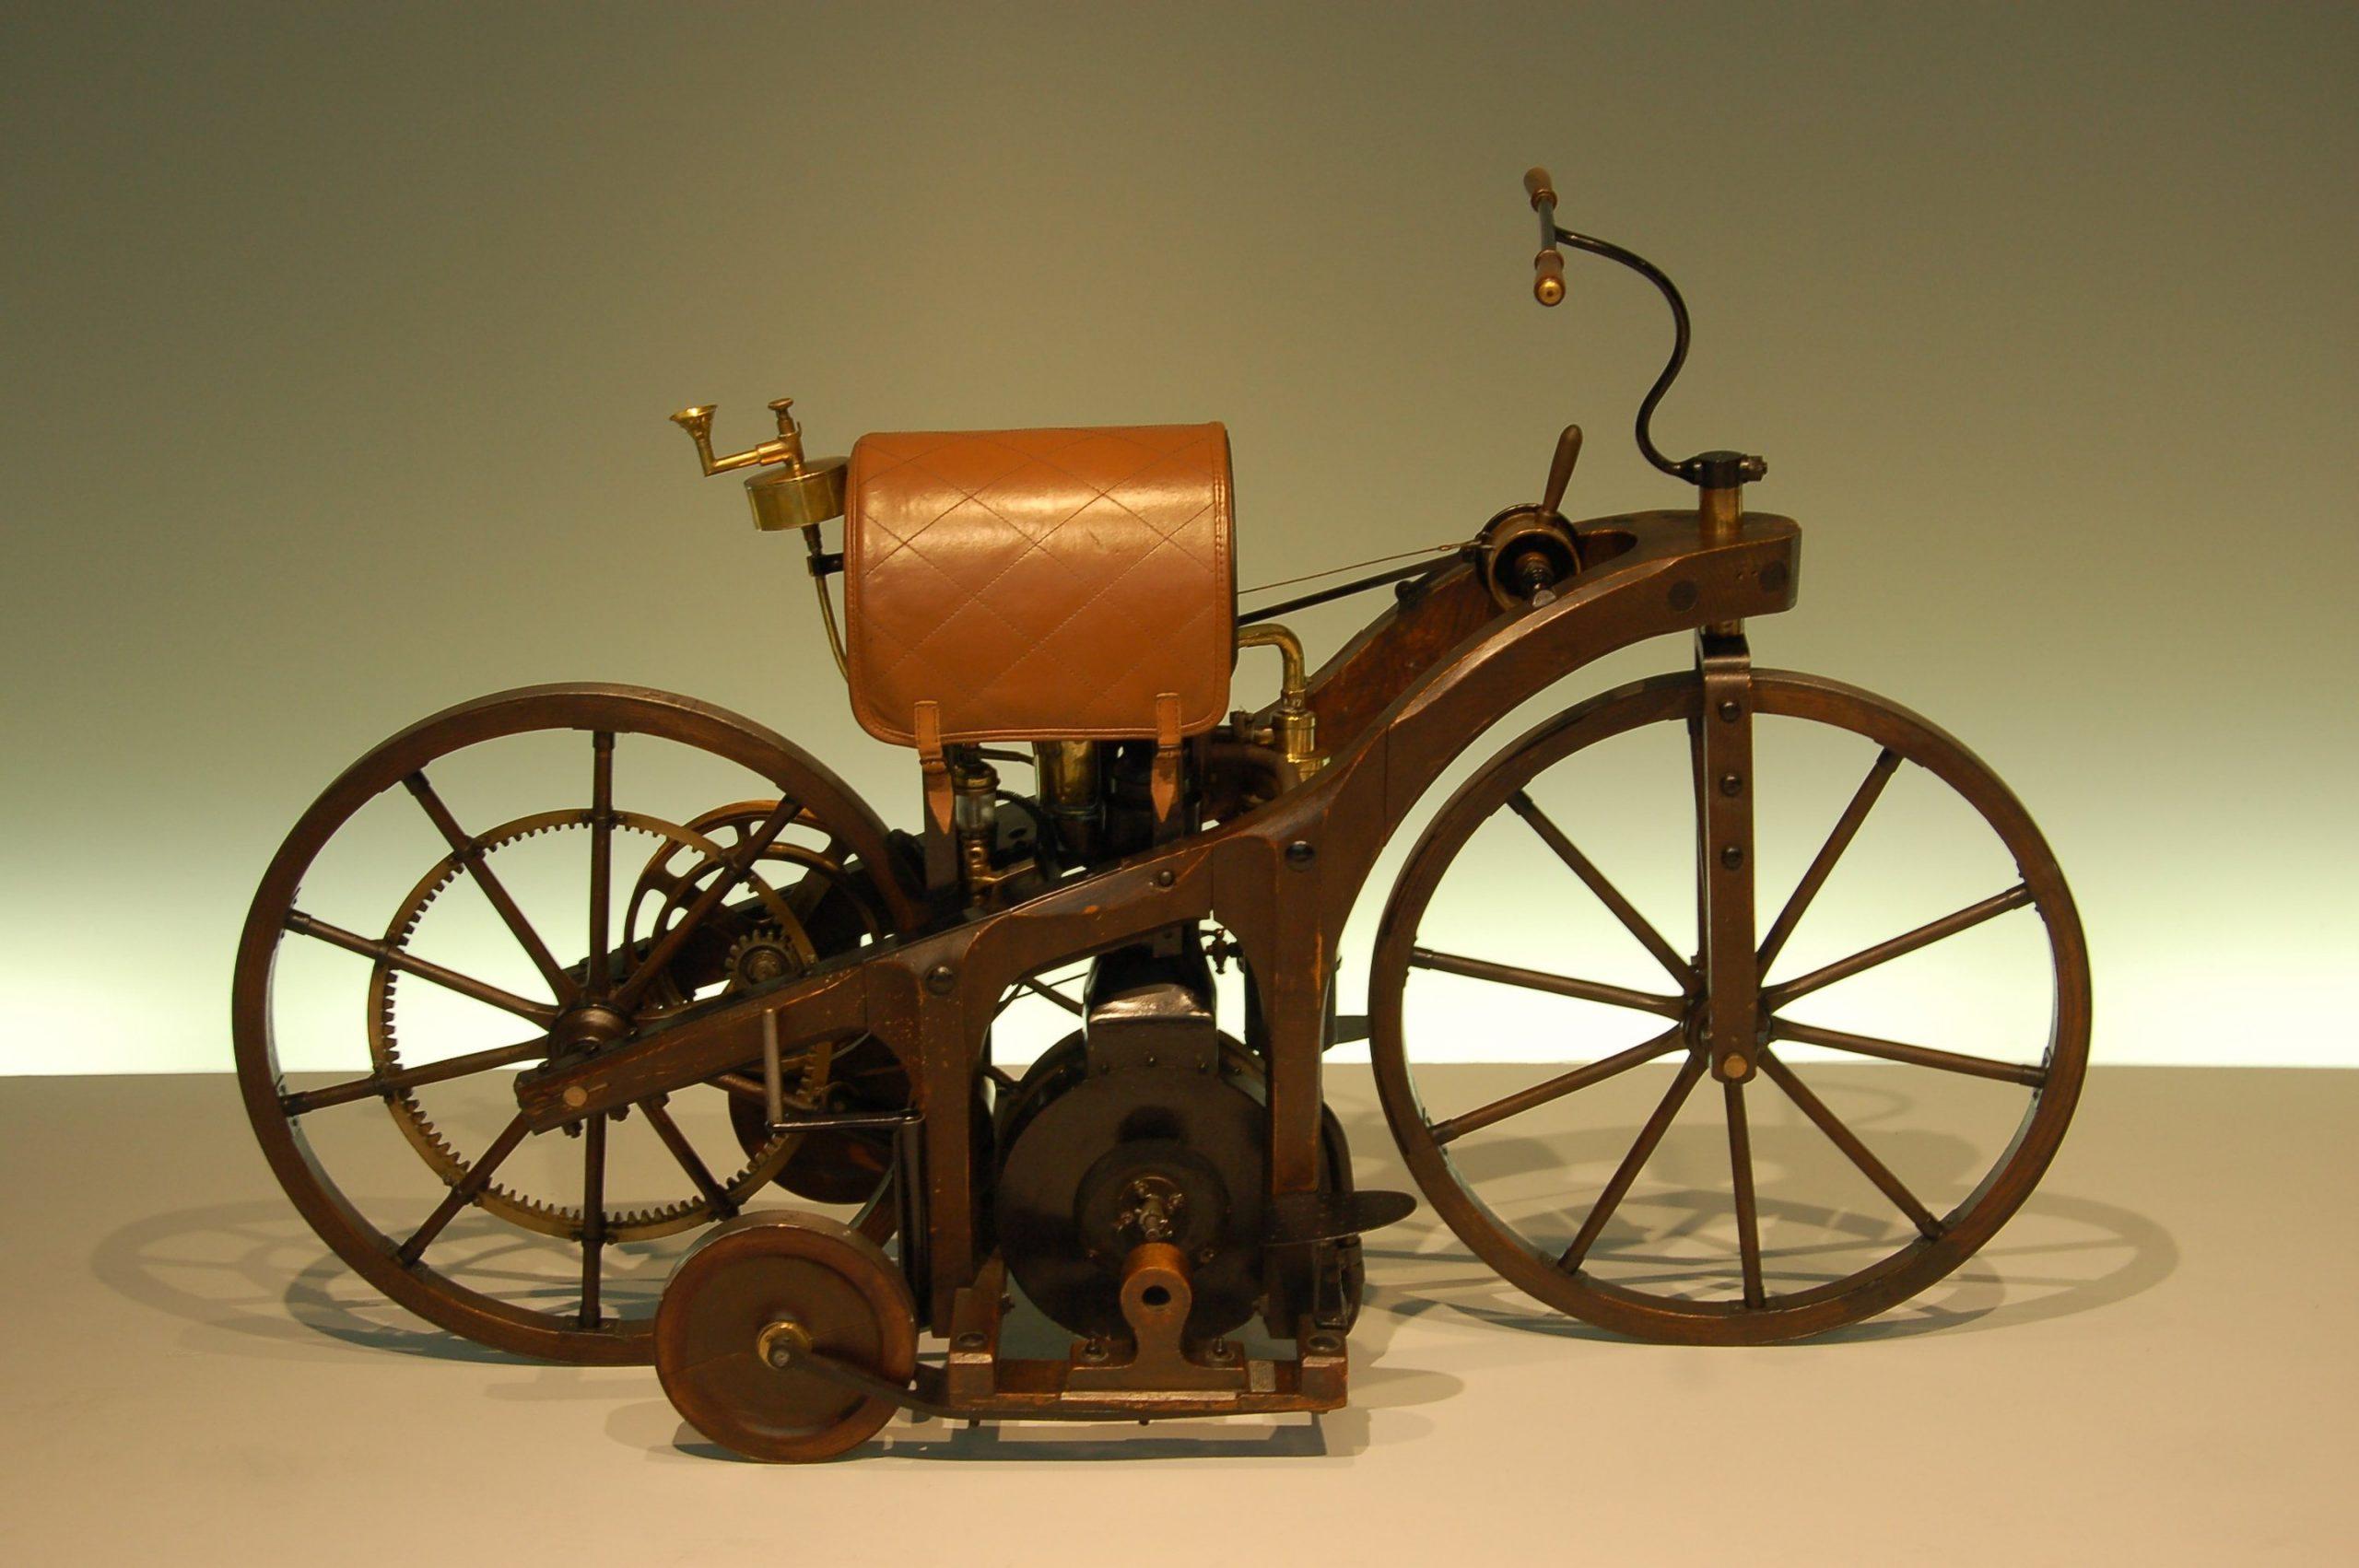 1885 Reitwagen internal combustion motorcycle on display in exhibit